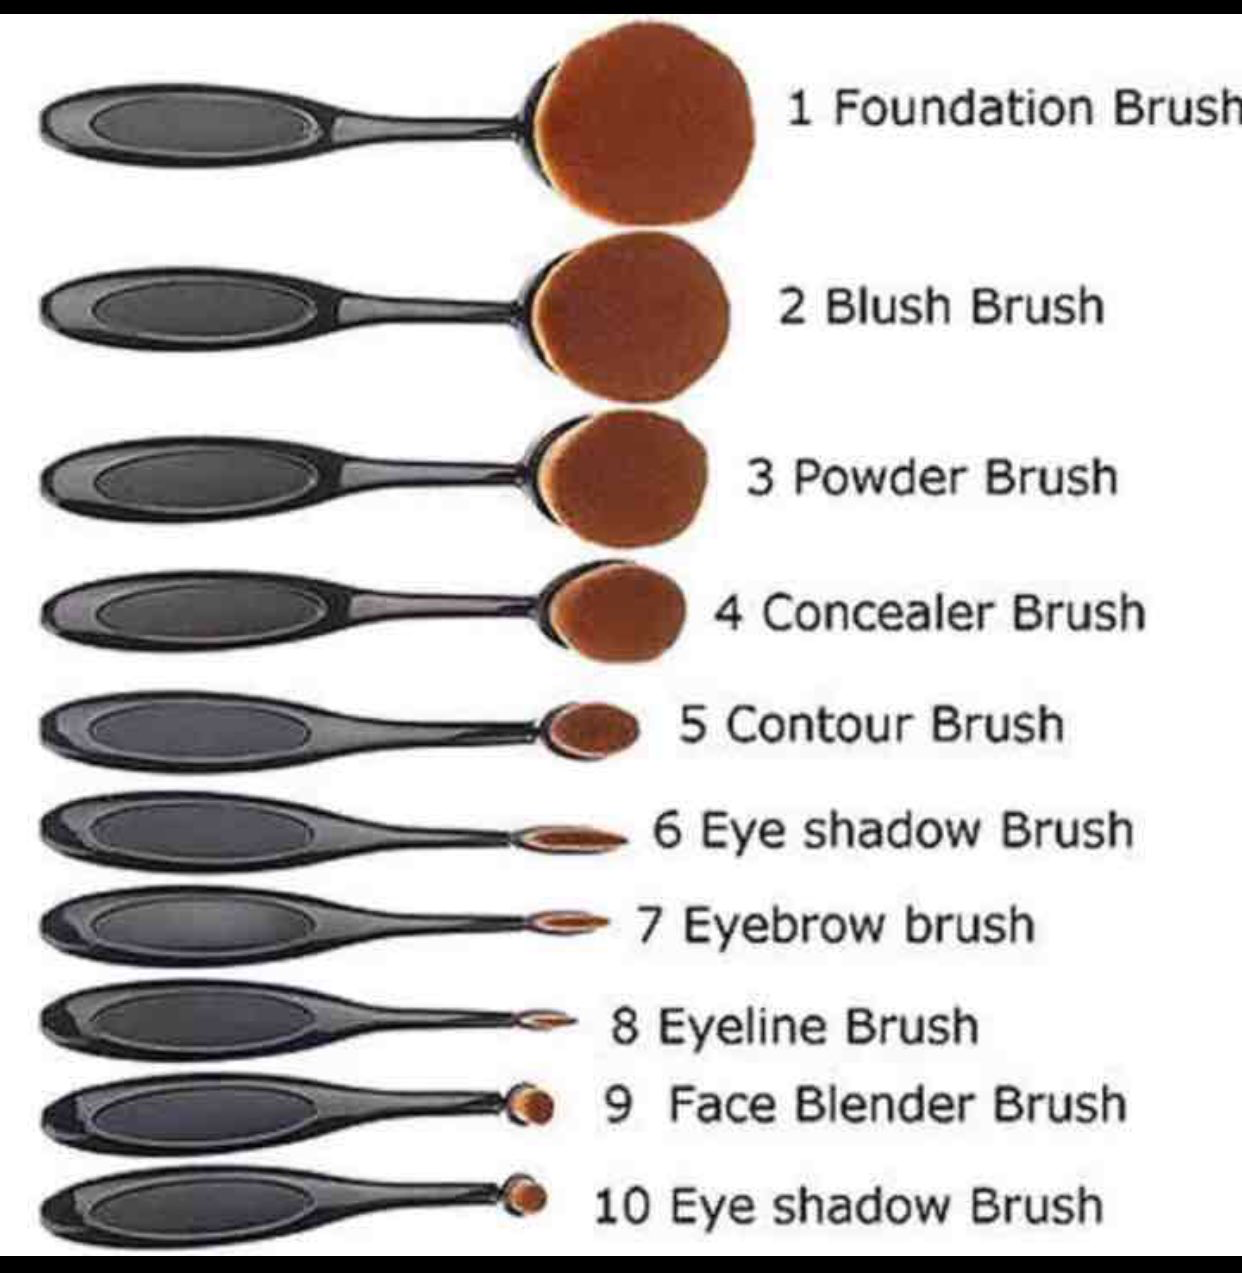 Oval Brush Guide